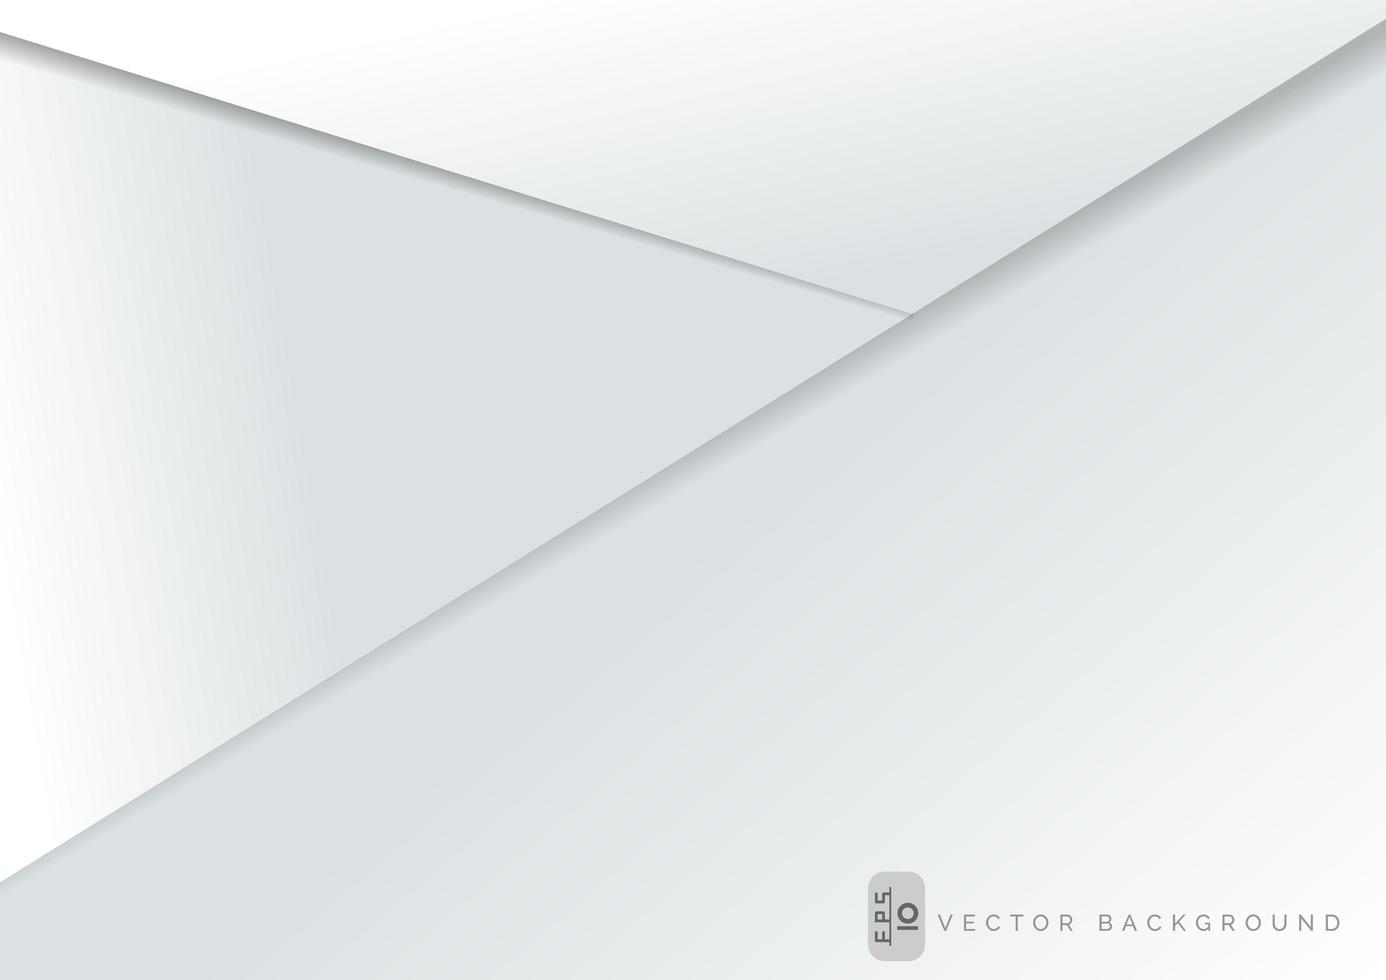 modelo de fundo de camadas de papel branco vetor